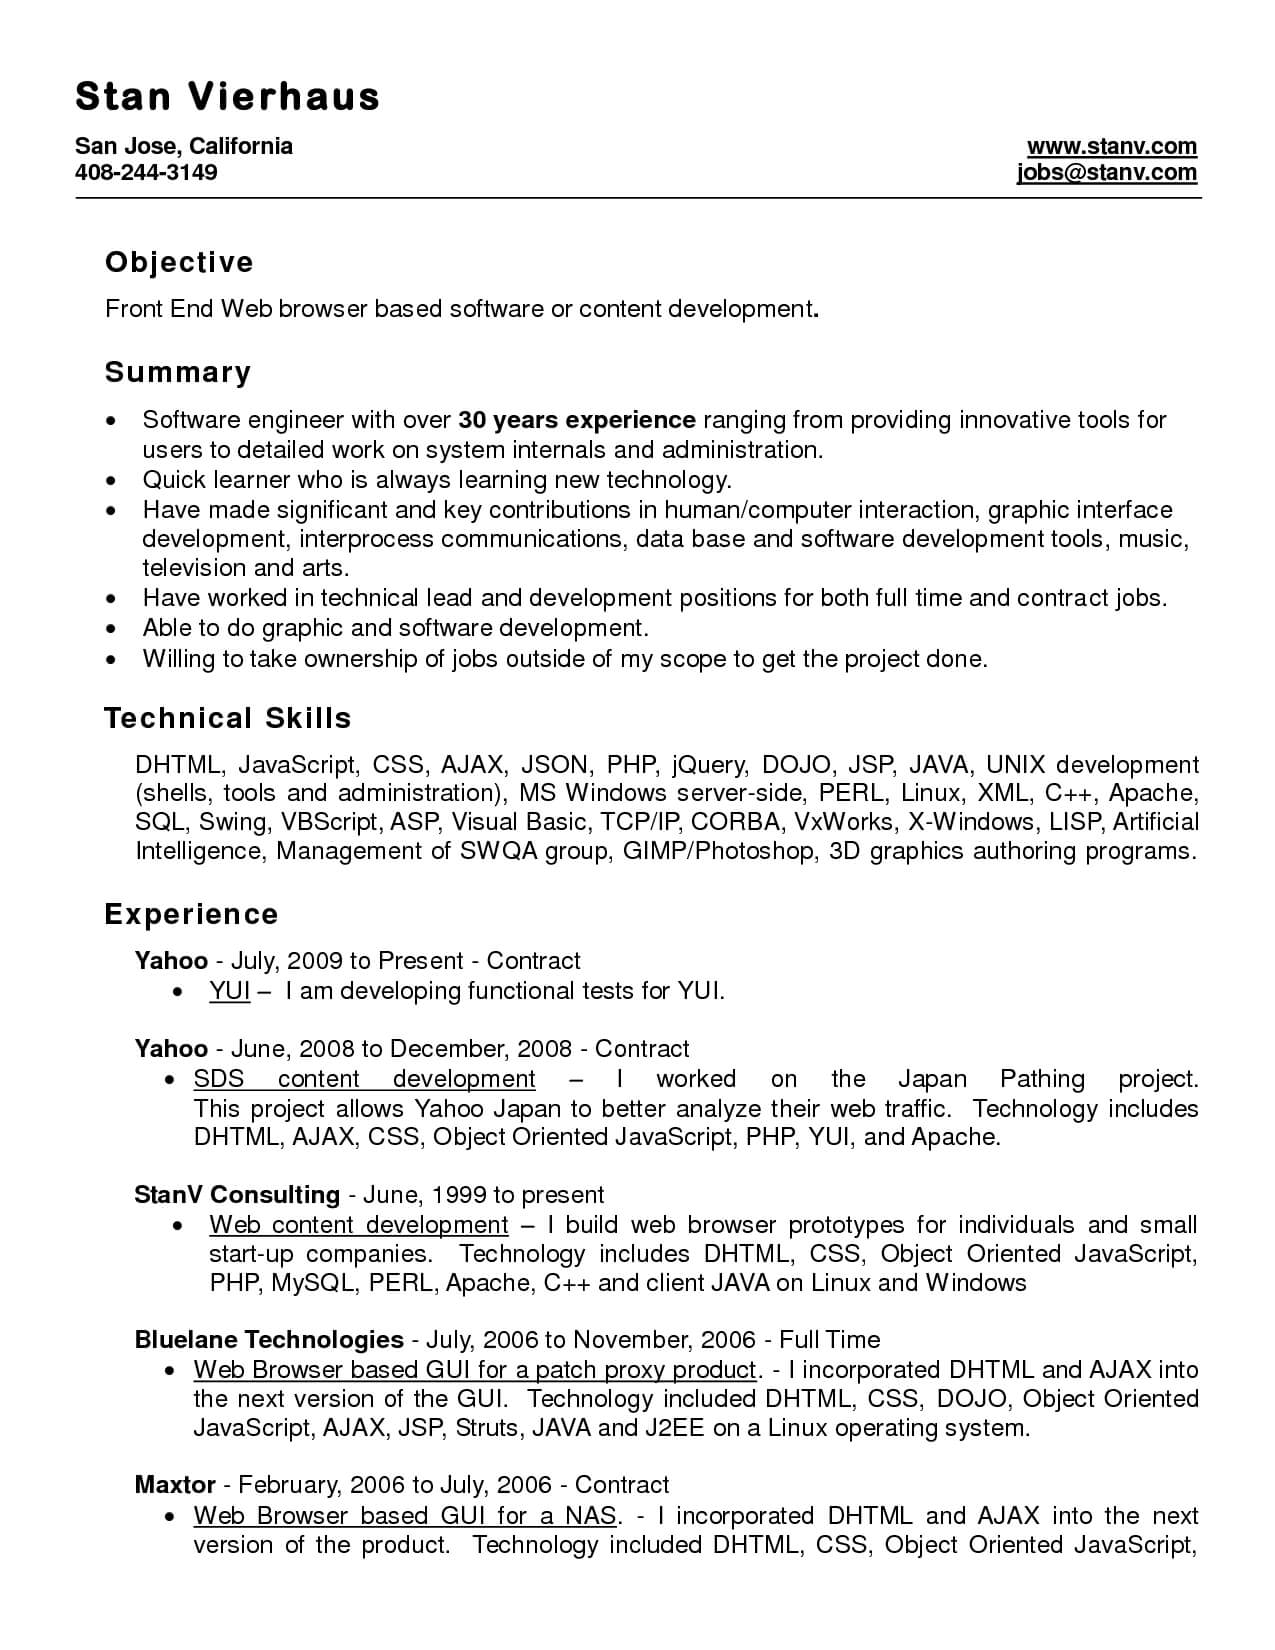 021 Resume Template Microsoft Word Ideas Dreaded 2007 Free inside Resume Templates Word 2007